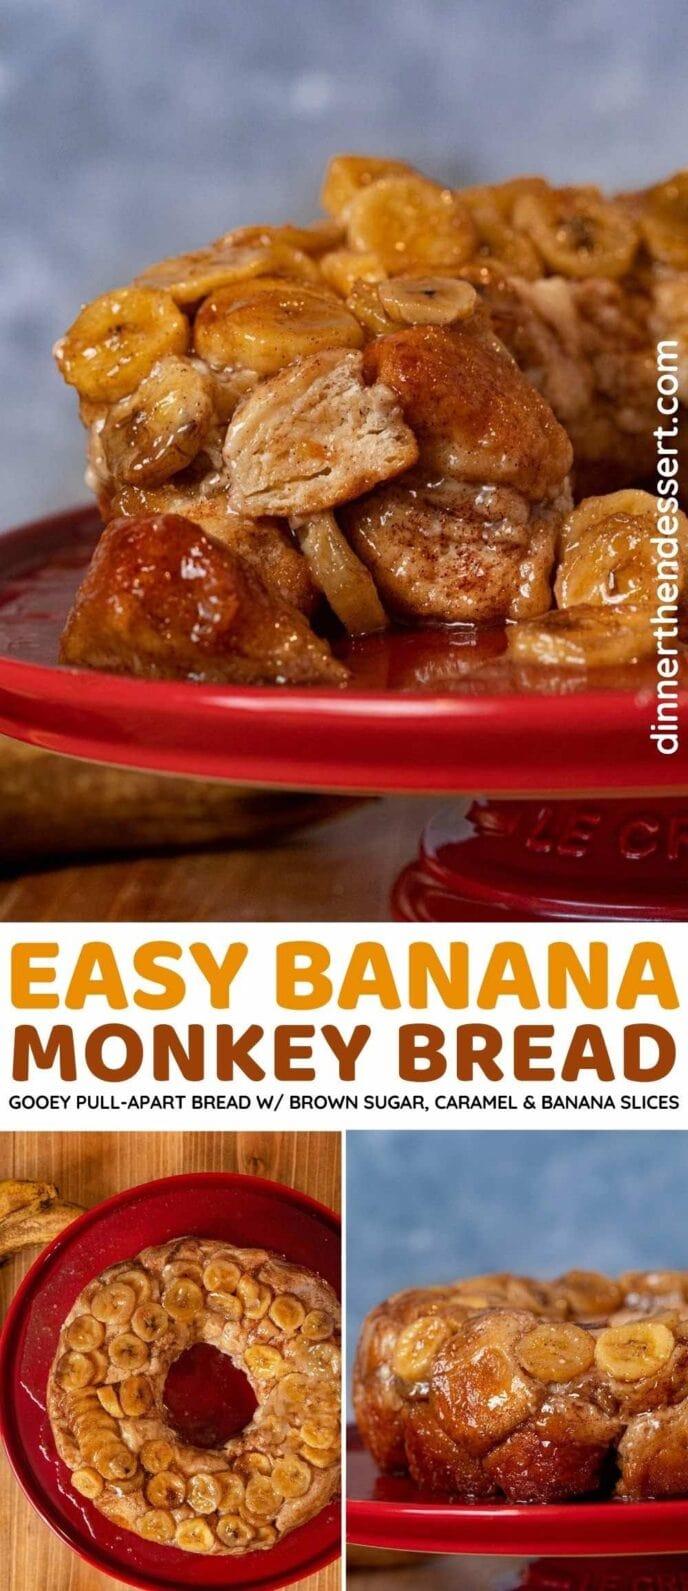 Banana Monkey Bread collage